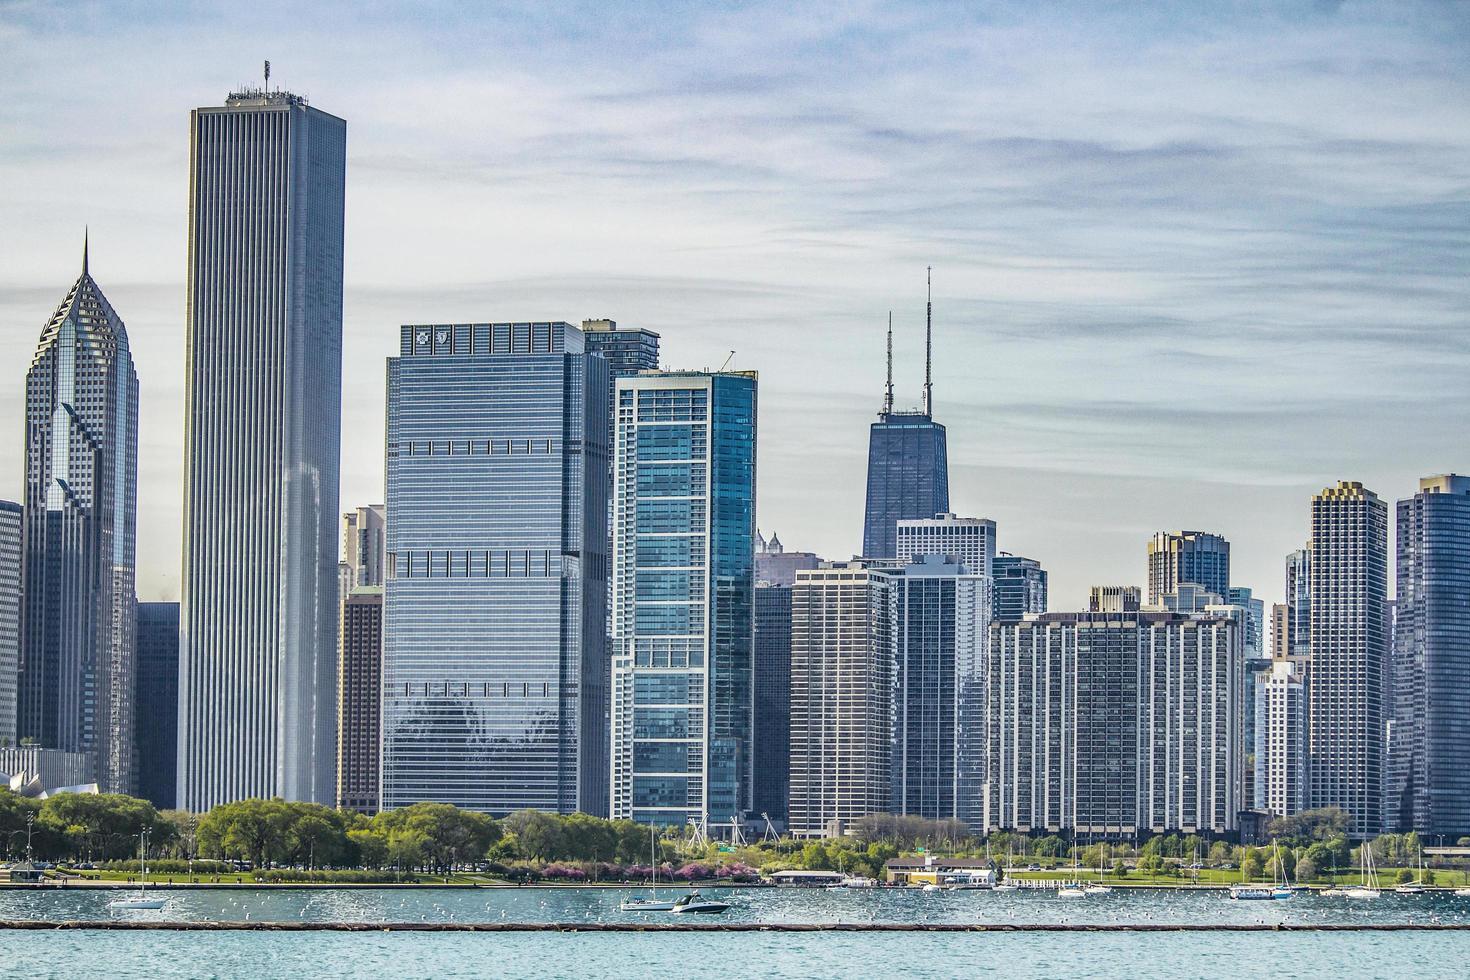 Downtown Chicago skyline photo